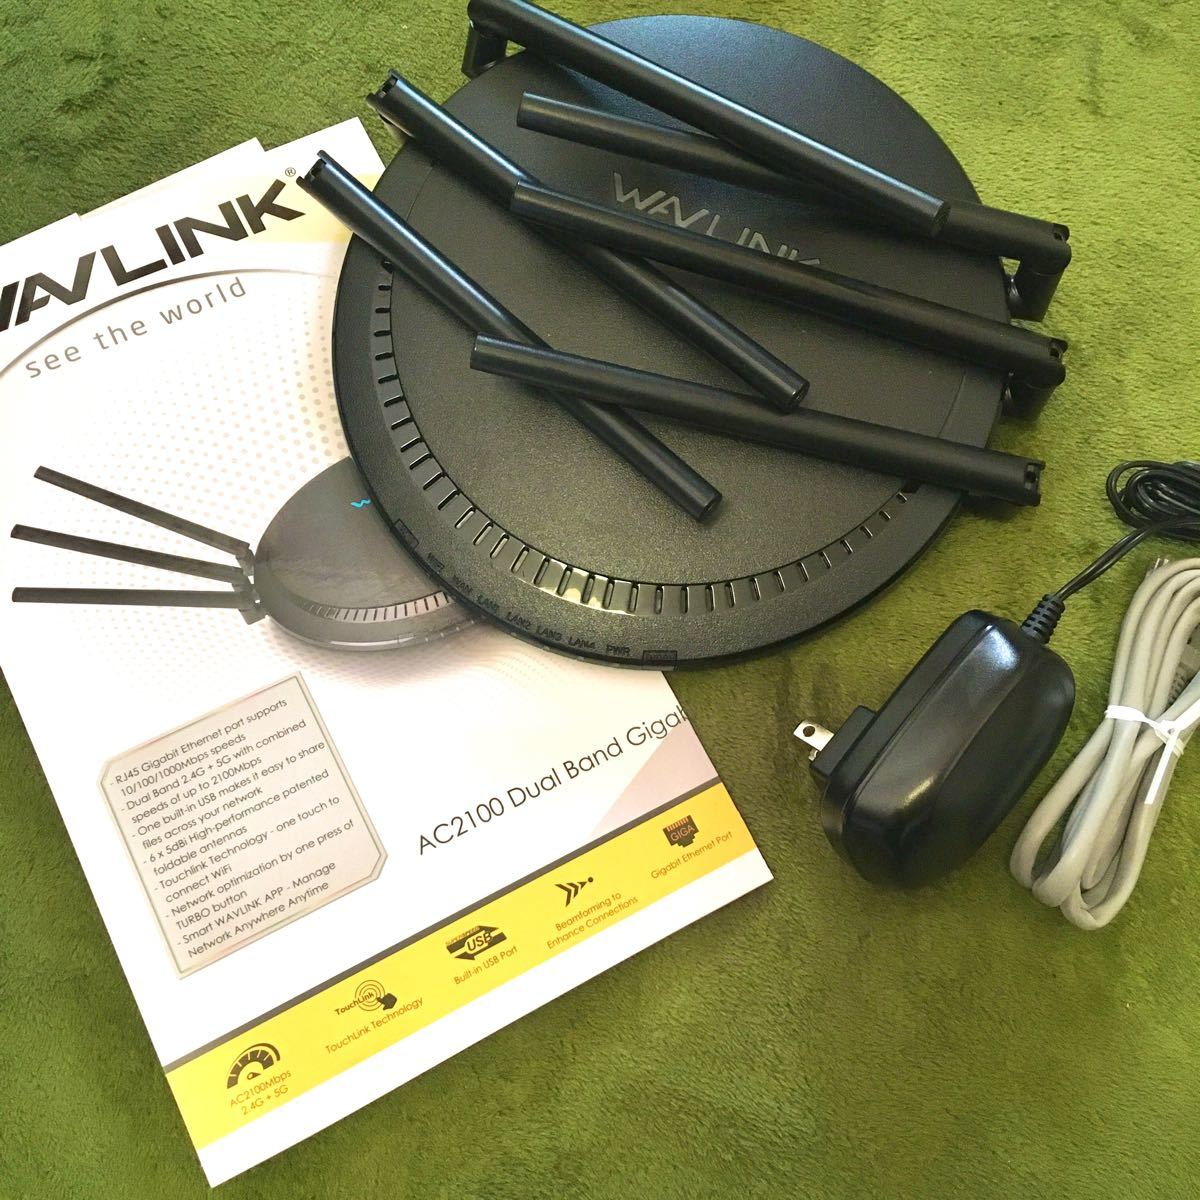 WAVLINK AC2100 WiFi無線LANルーター 11ac・ デュアルバンド(1733 + 800 )日本語説明書付き